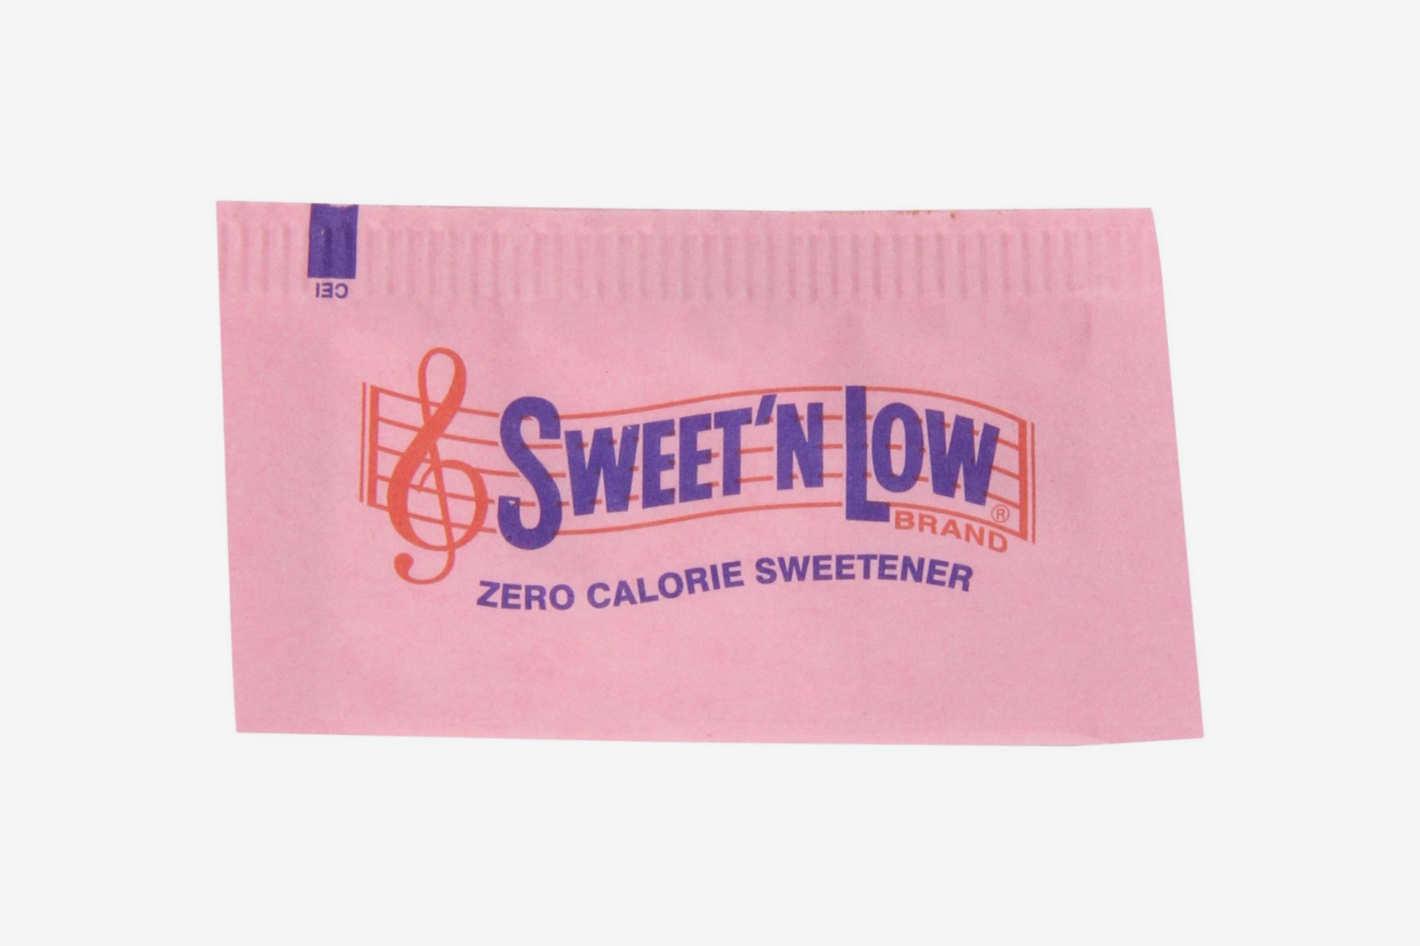 Sweet 'N Low Zero Calorie Sweetner